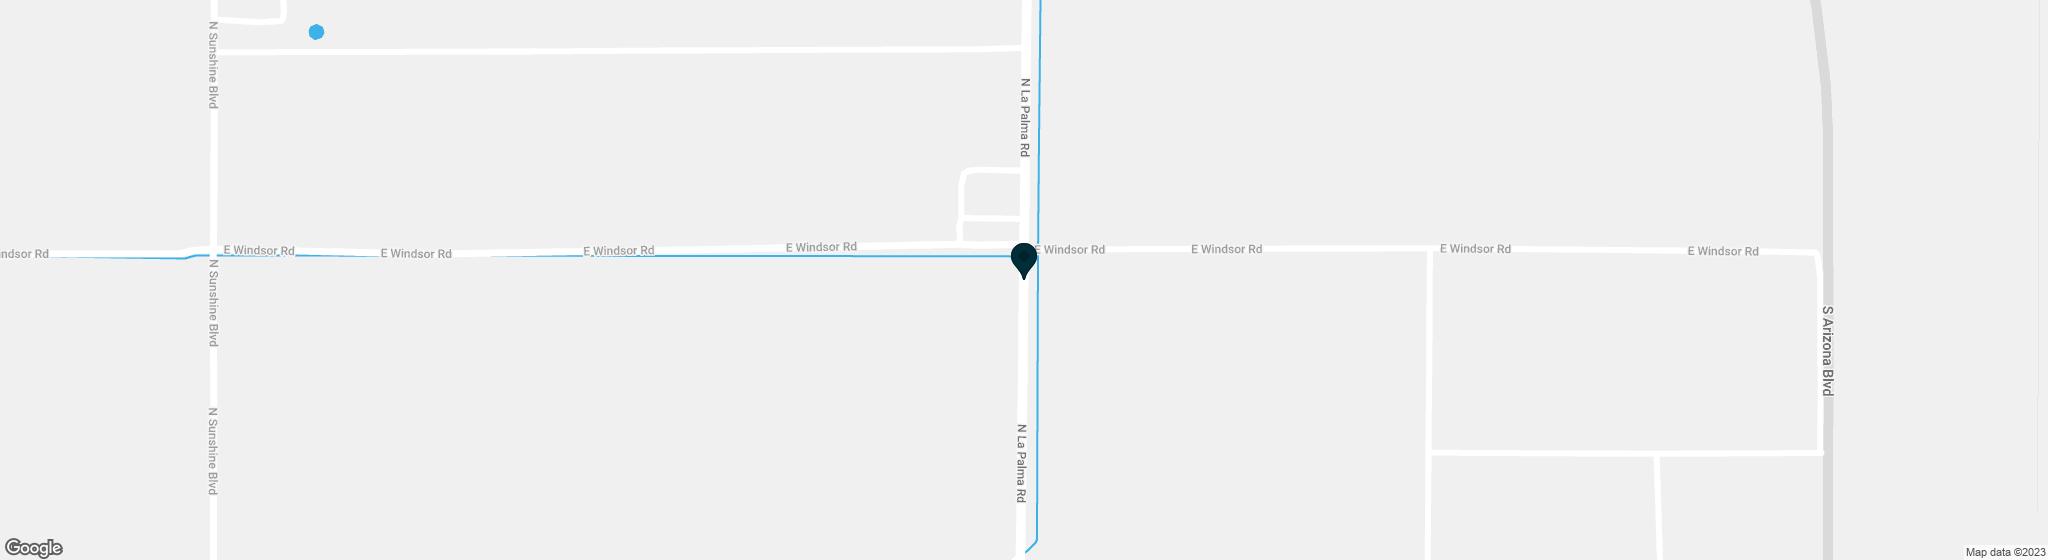 000 N La Palma Road - Coolidge AZ 85128